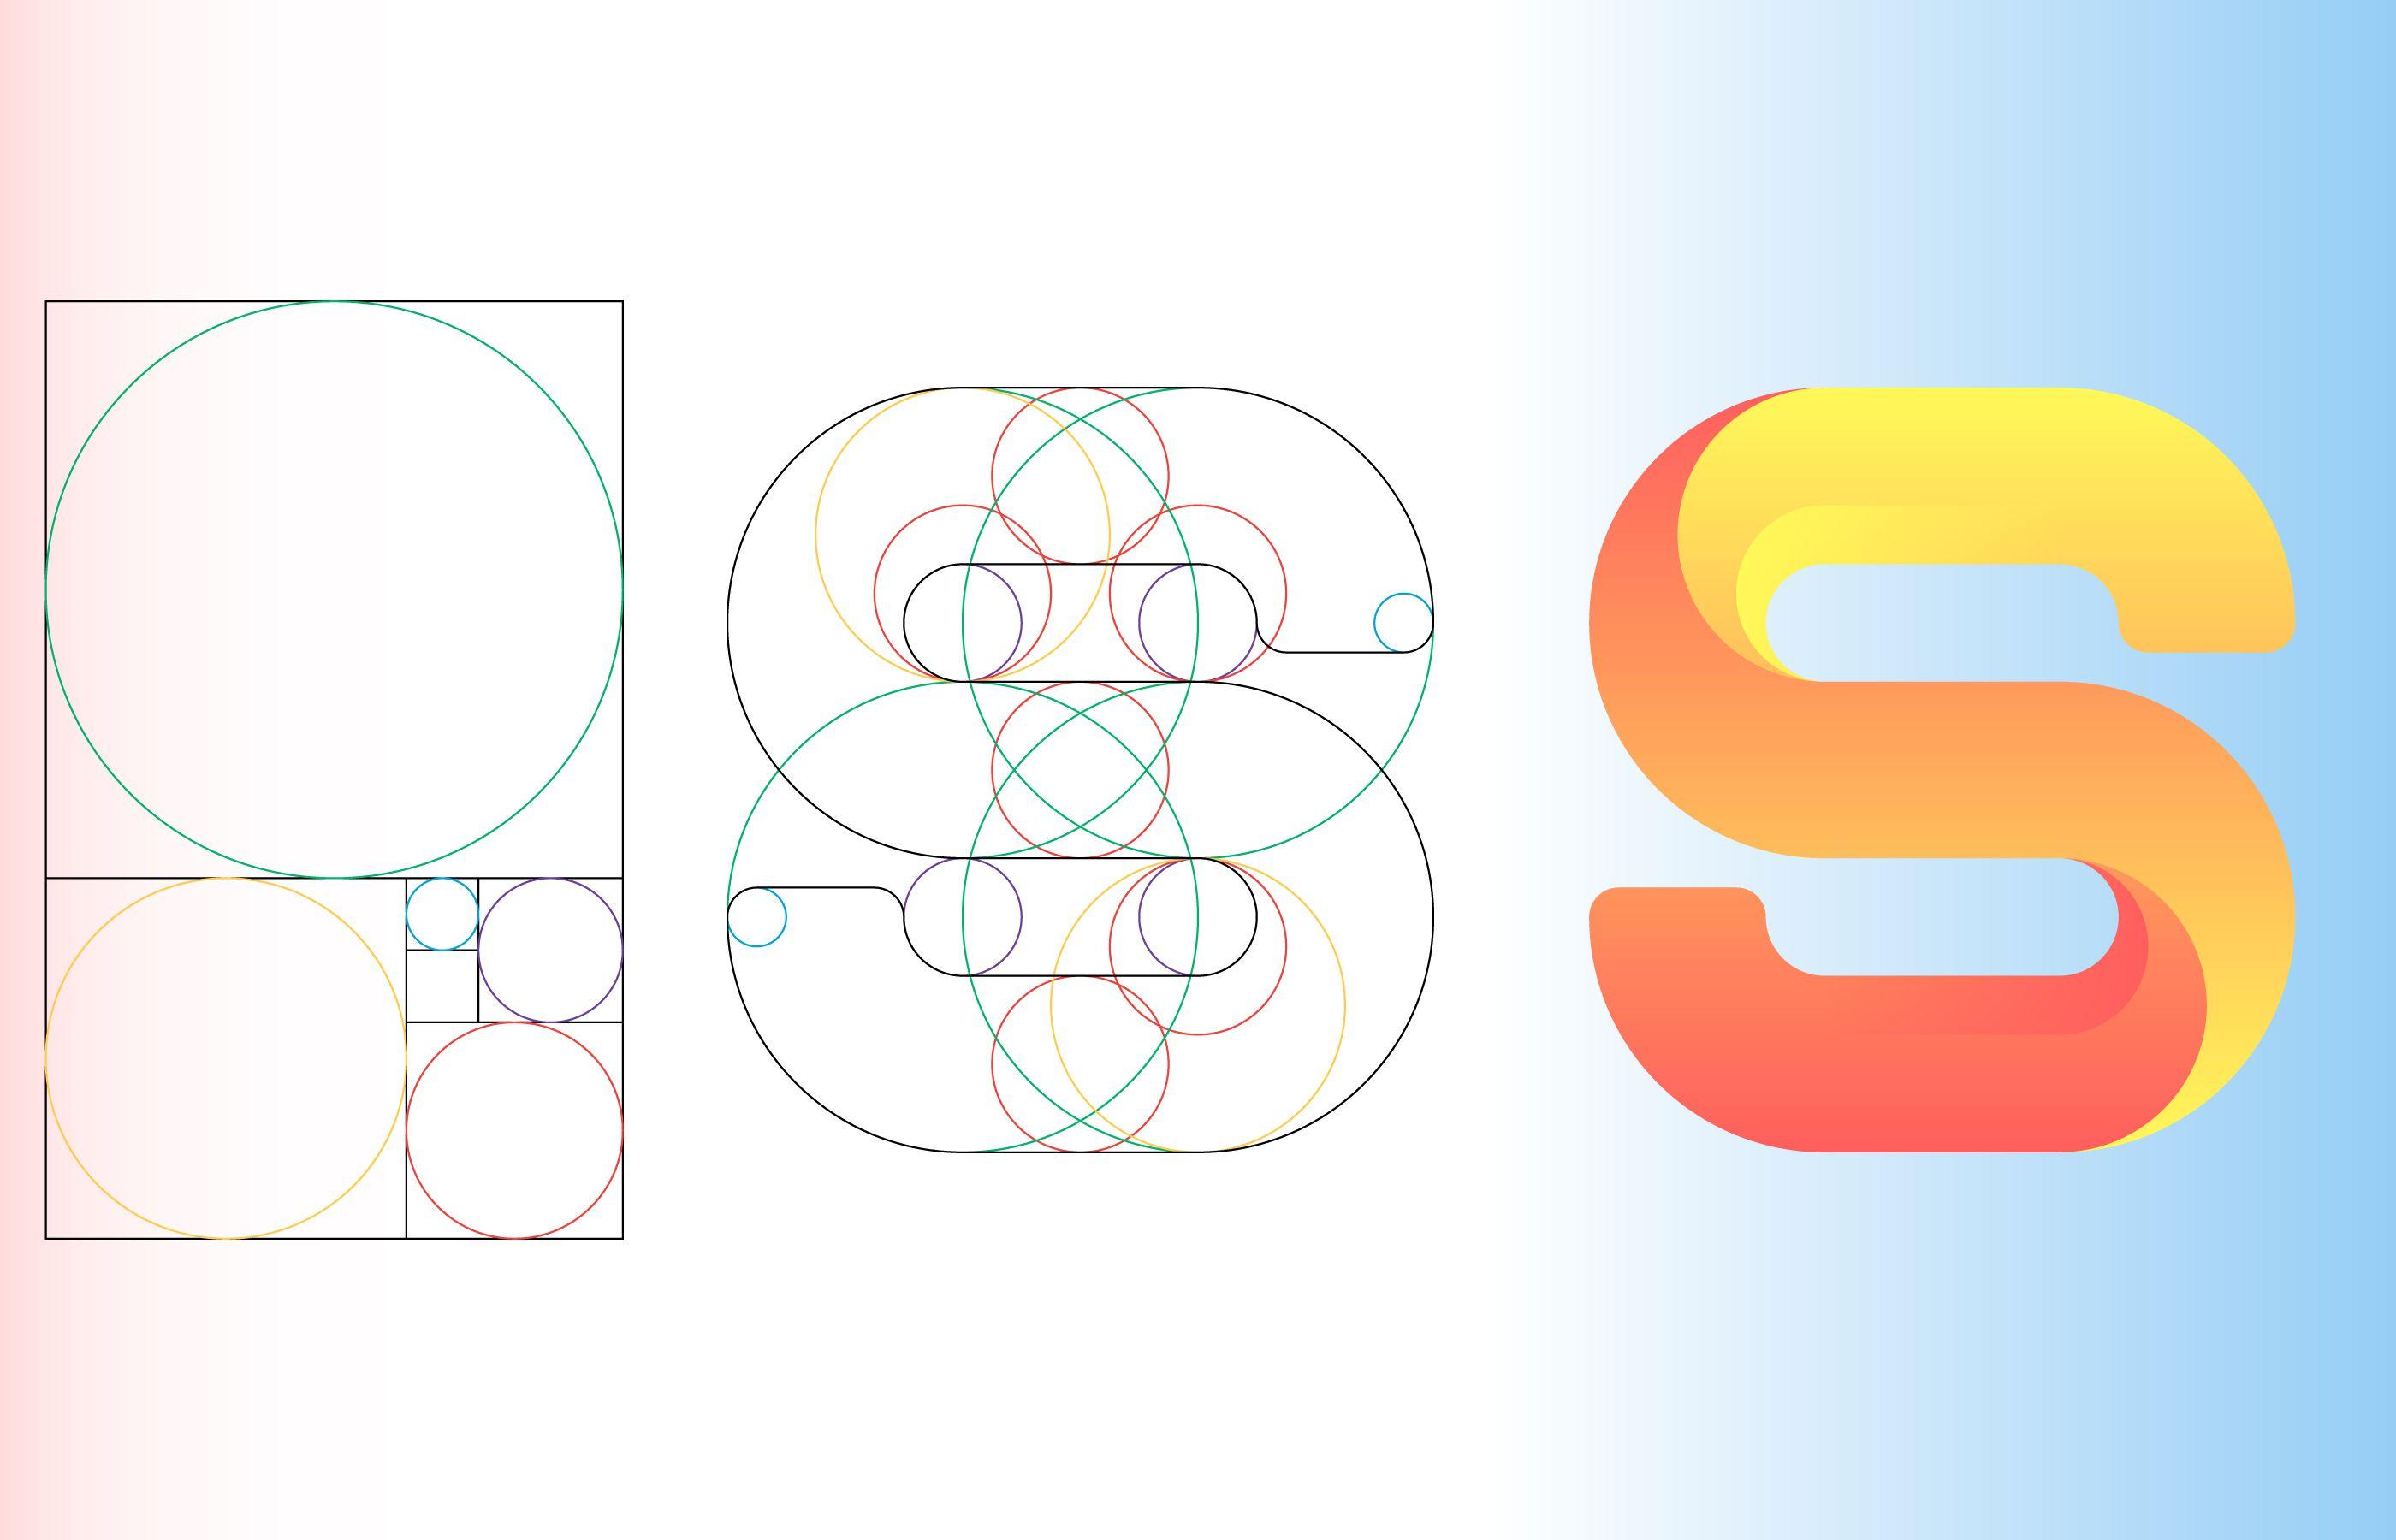 golden ratio design template  addictionary